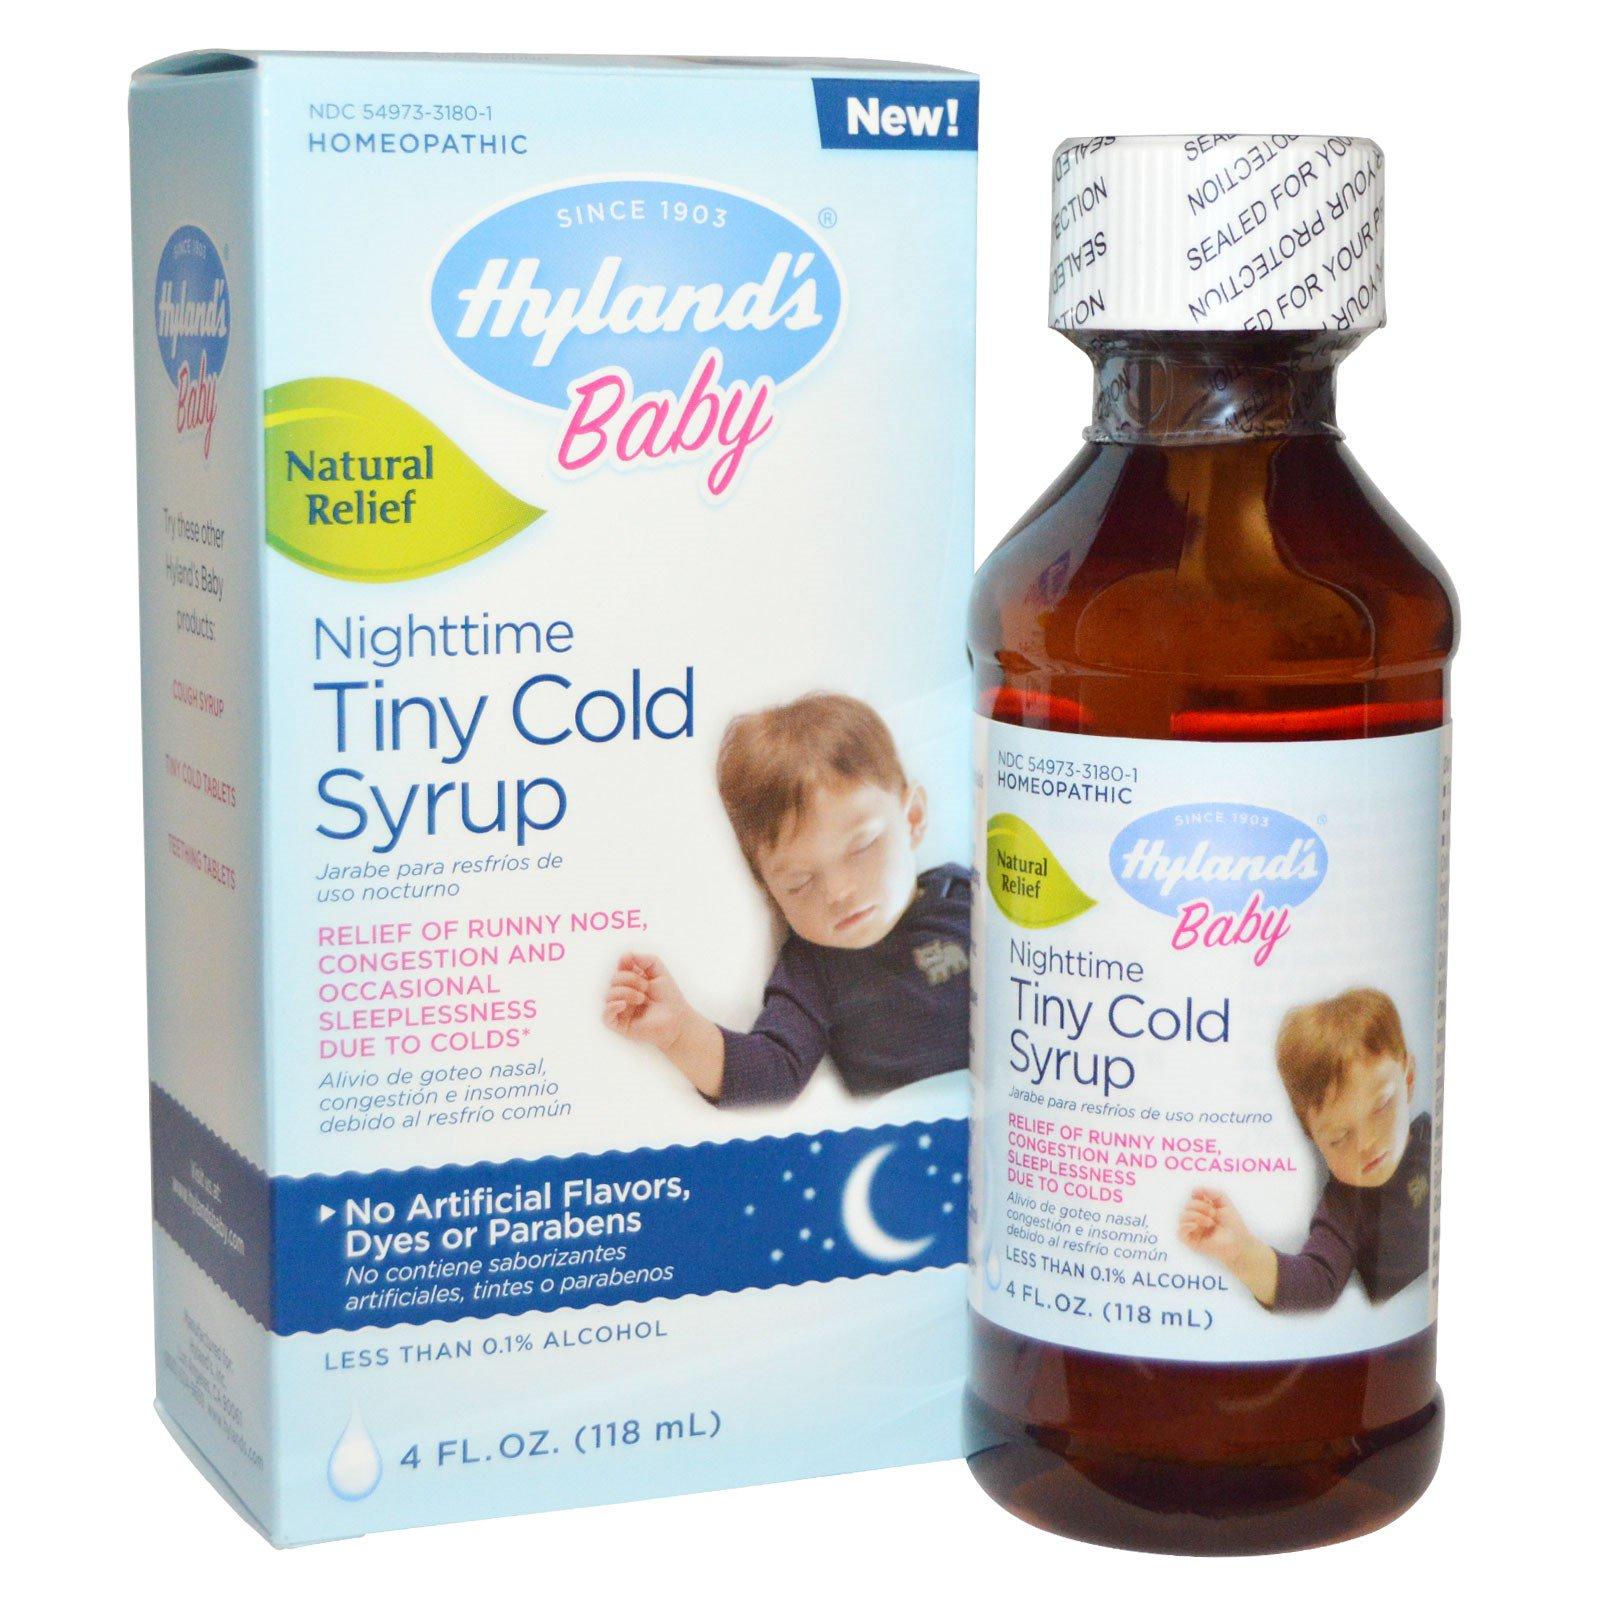 Hyland S Baby Nighttime Tiny Cold Syrup 4 Fl Oz 118 Ml